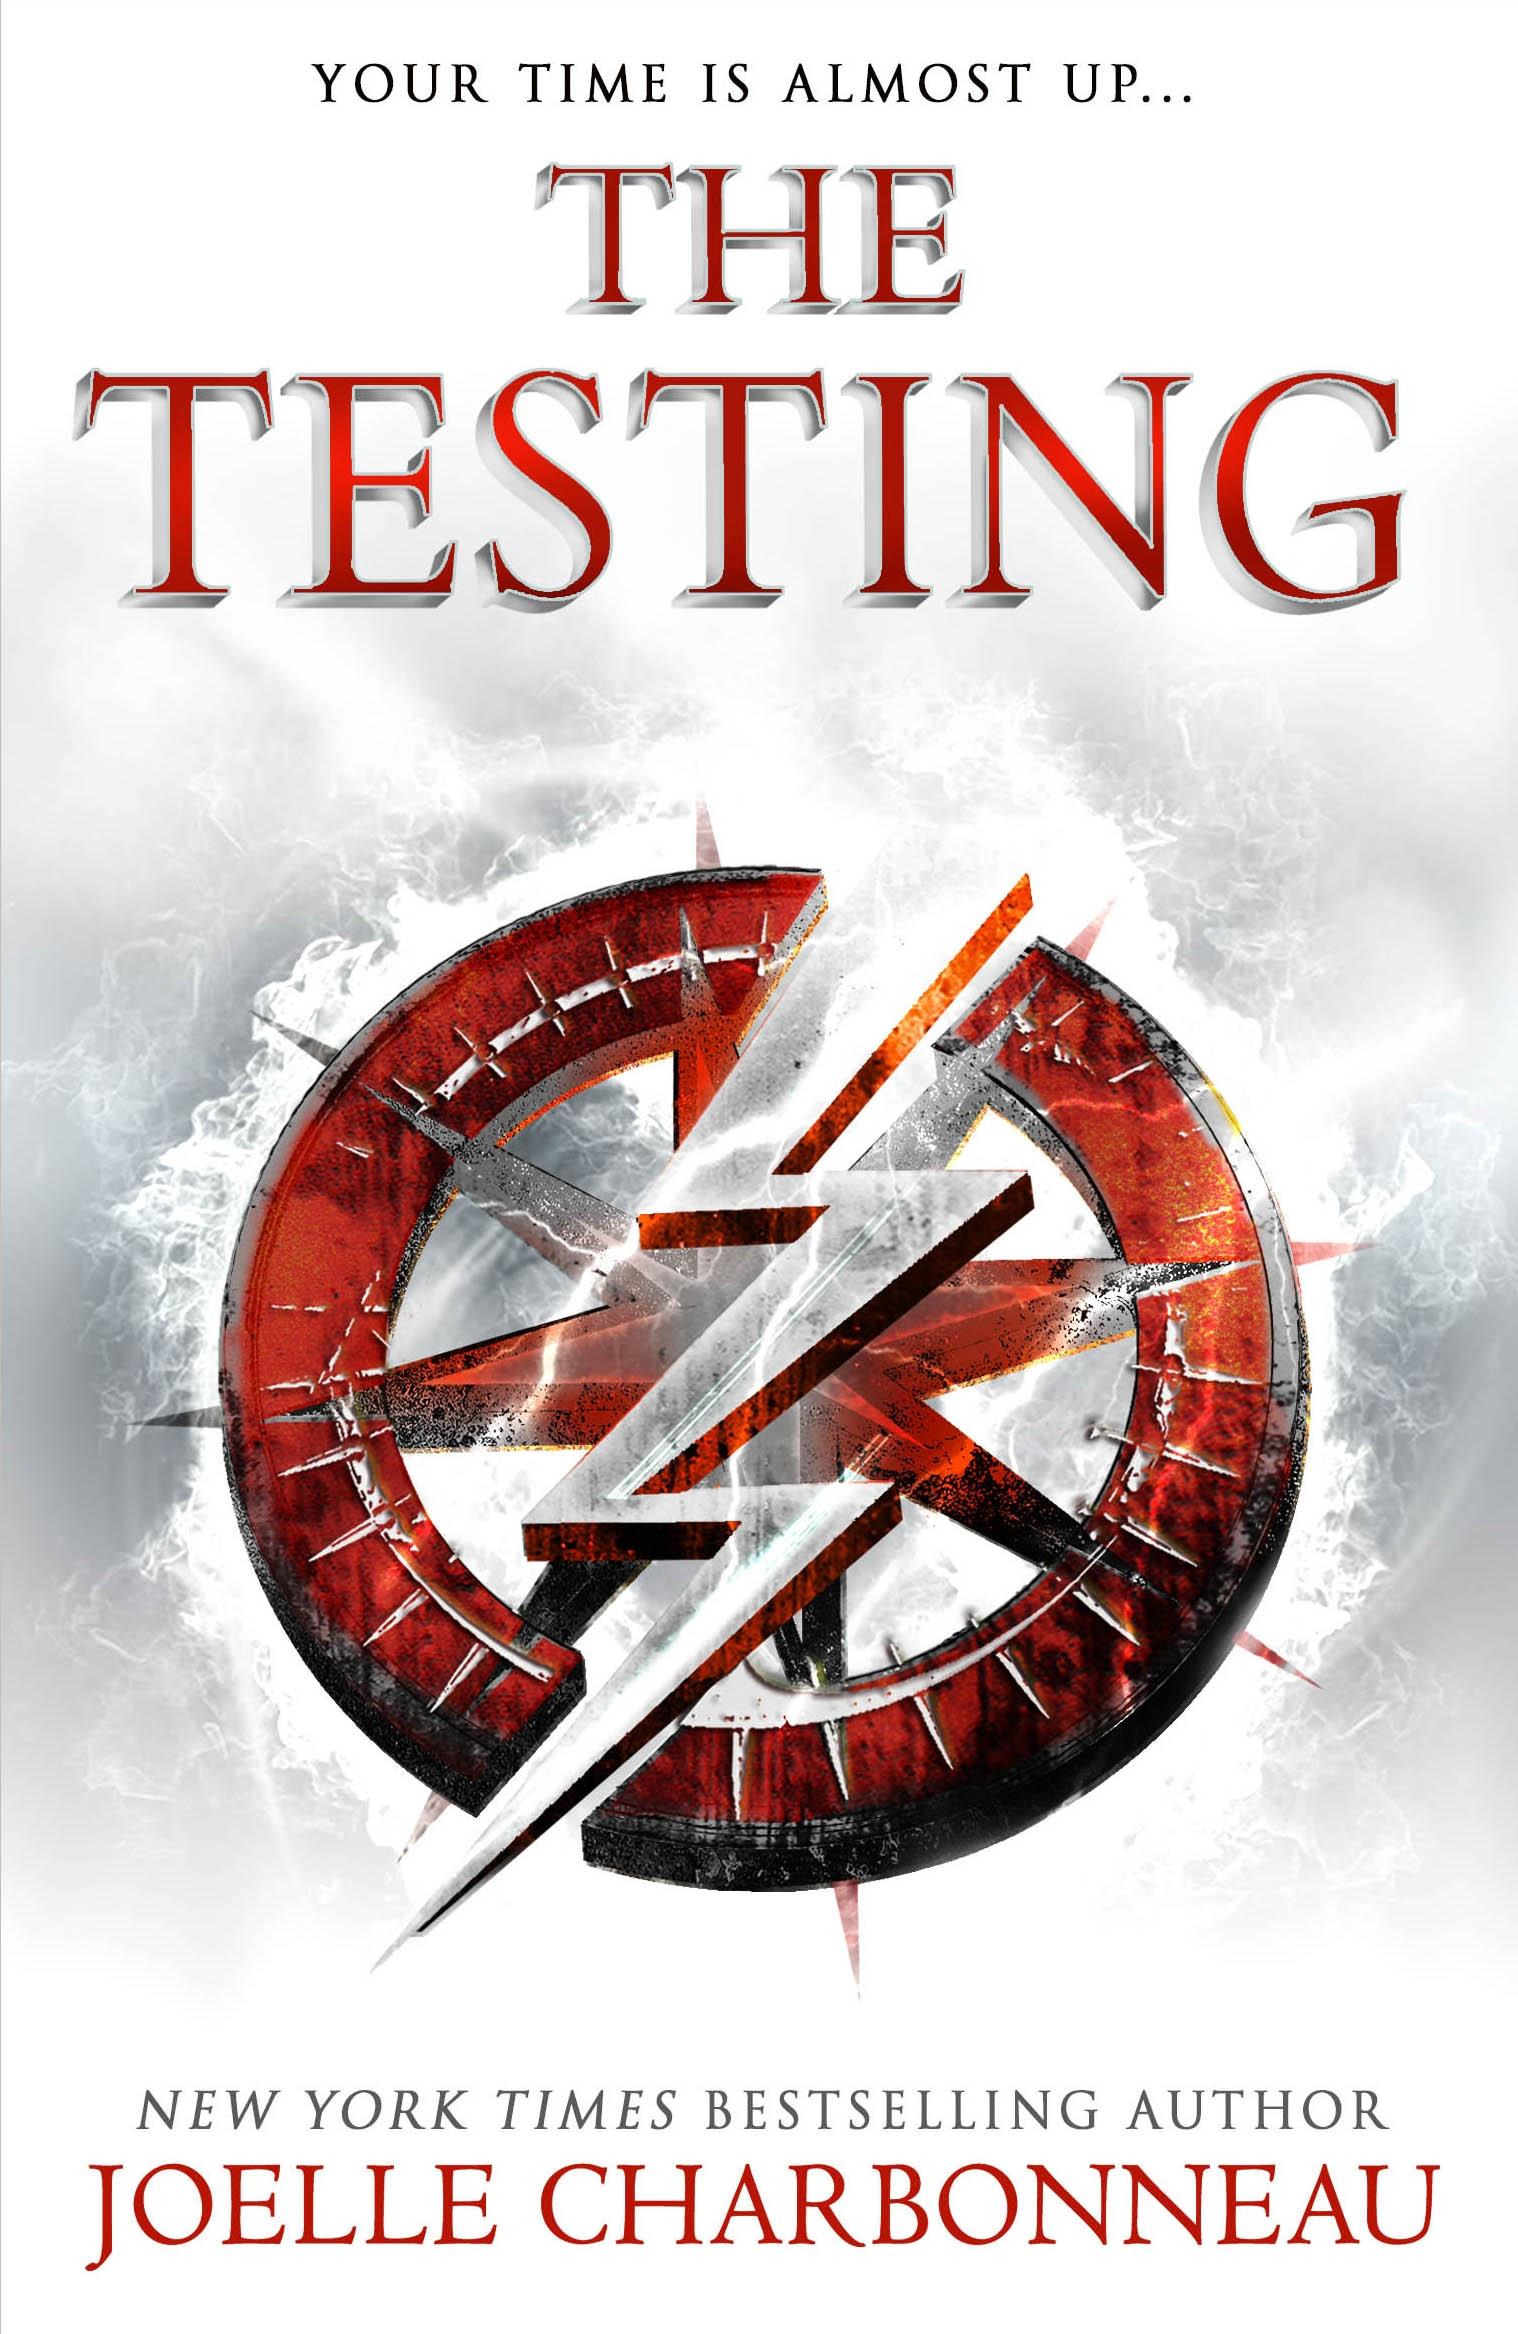 The Testing by Joelle Charbonneau